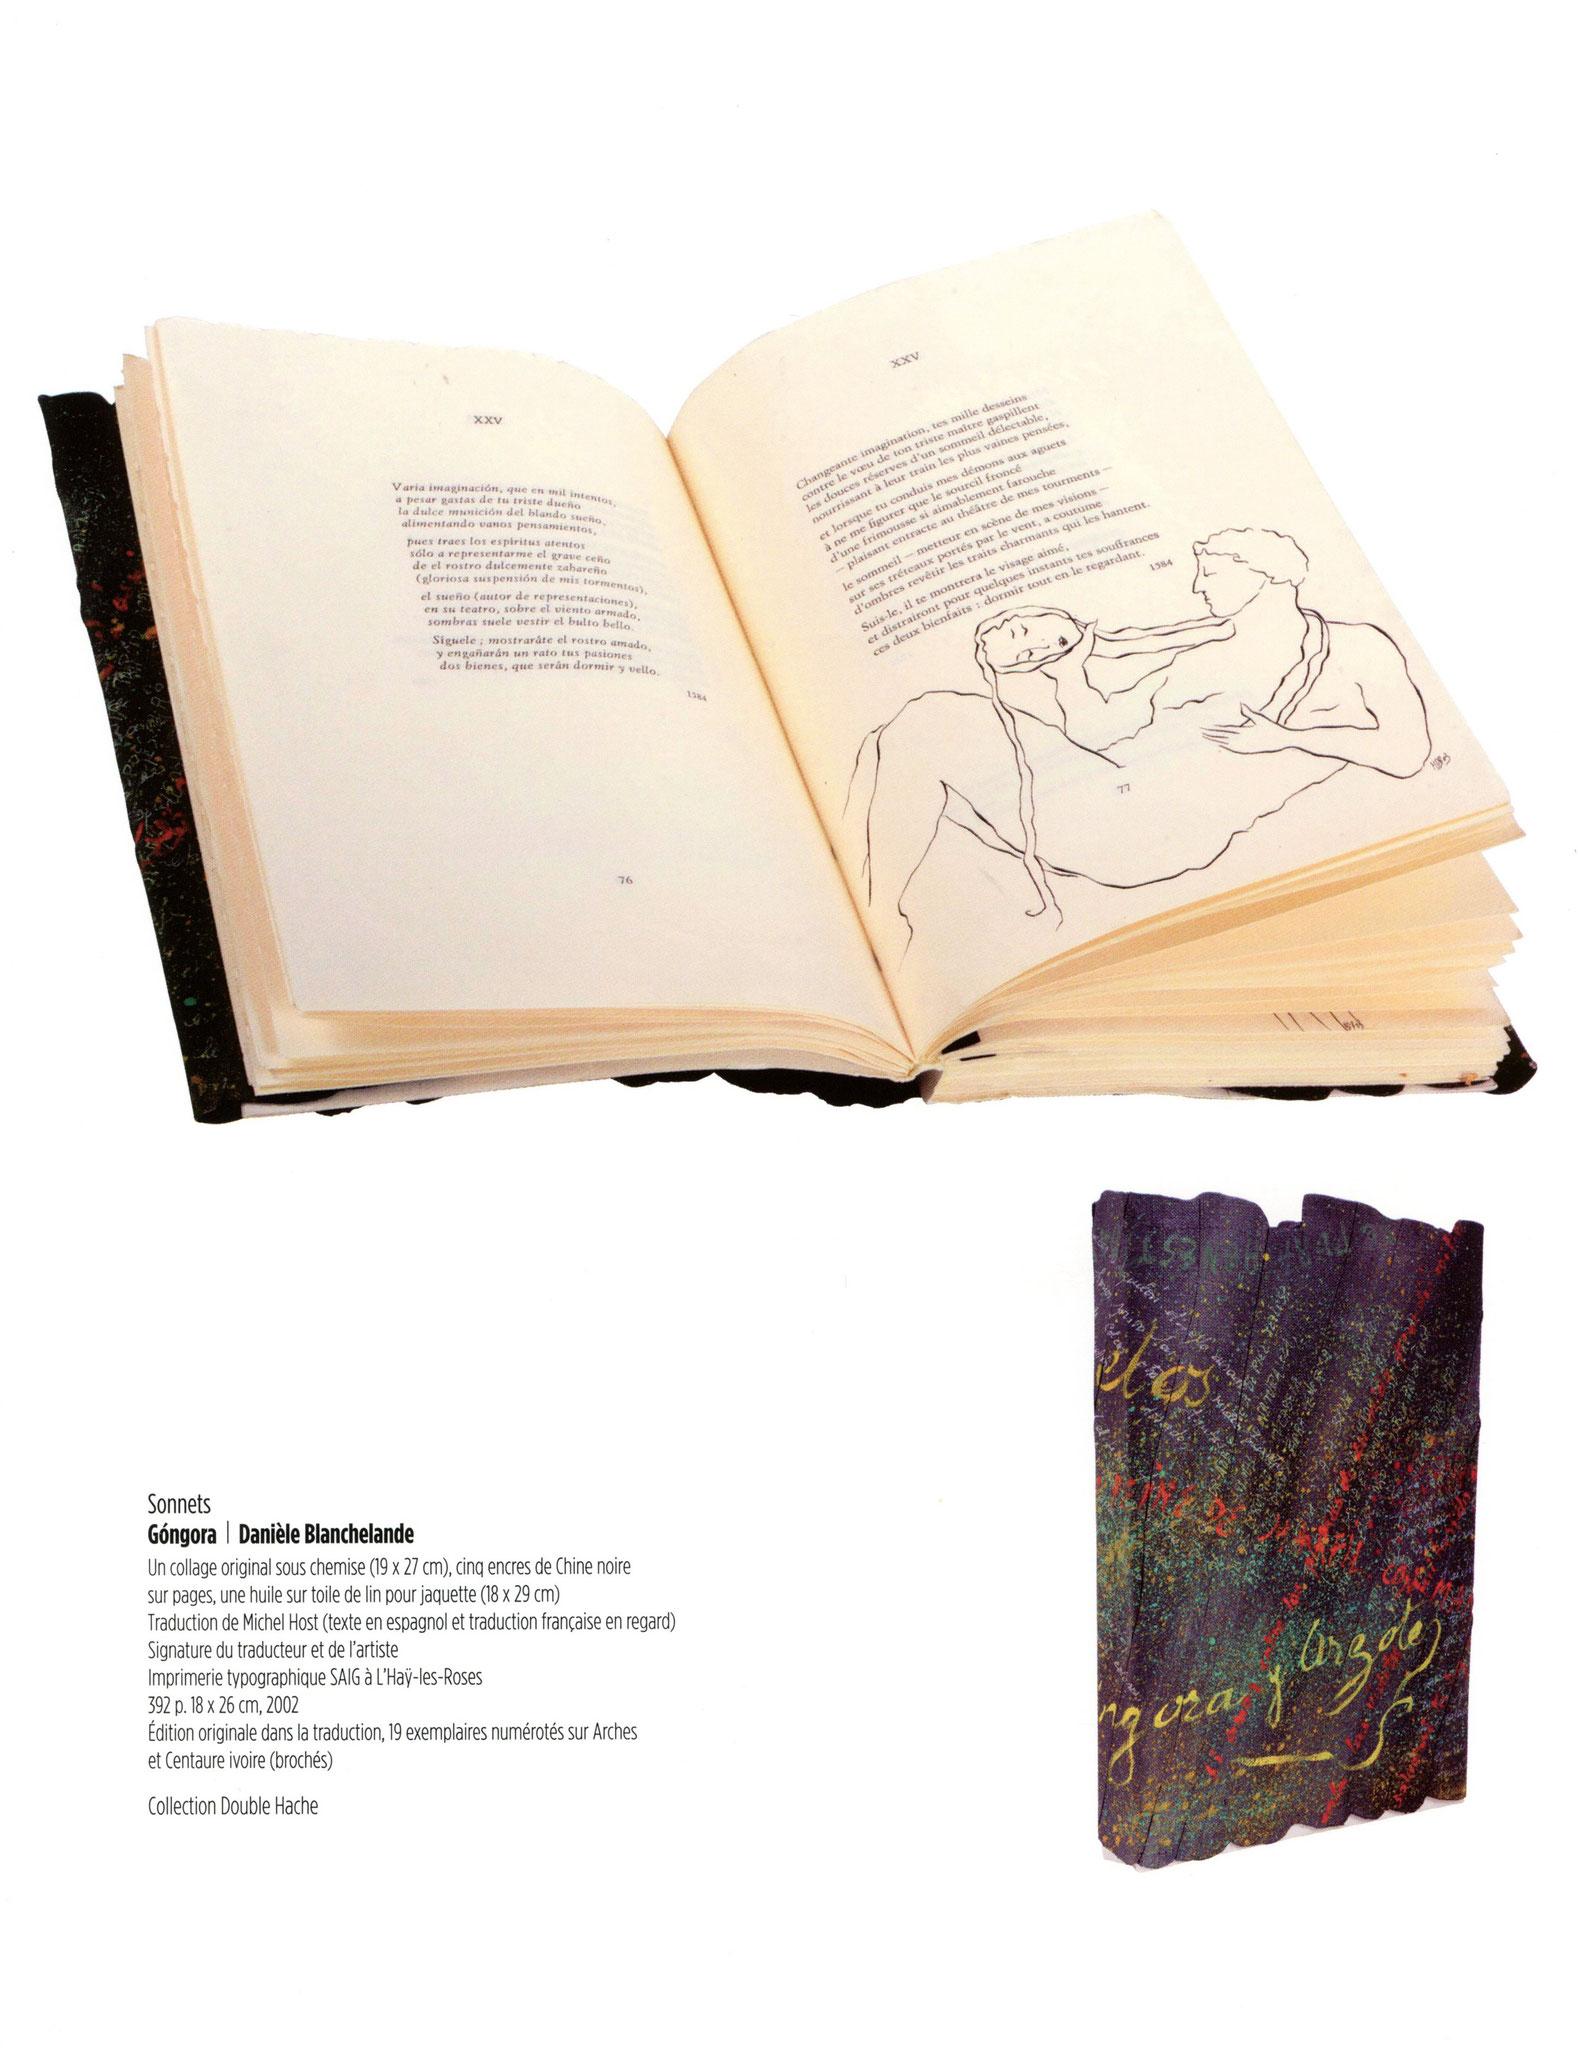 Sonnets - Góngora / Danièle Blanchelande